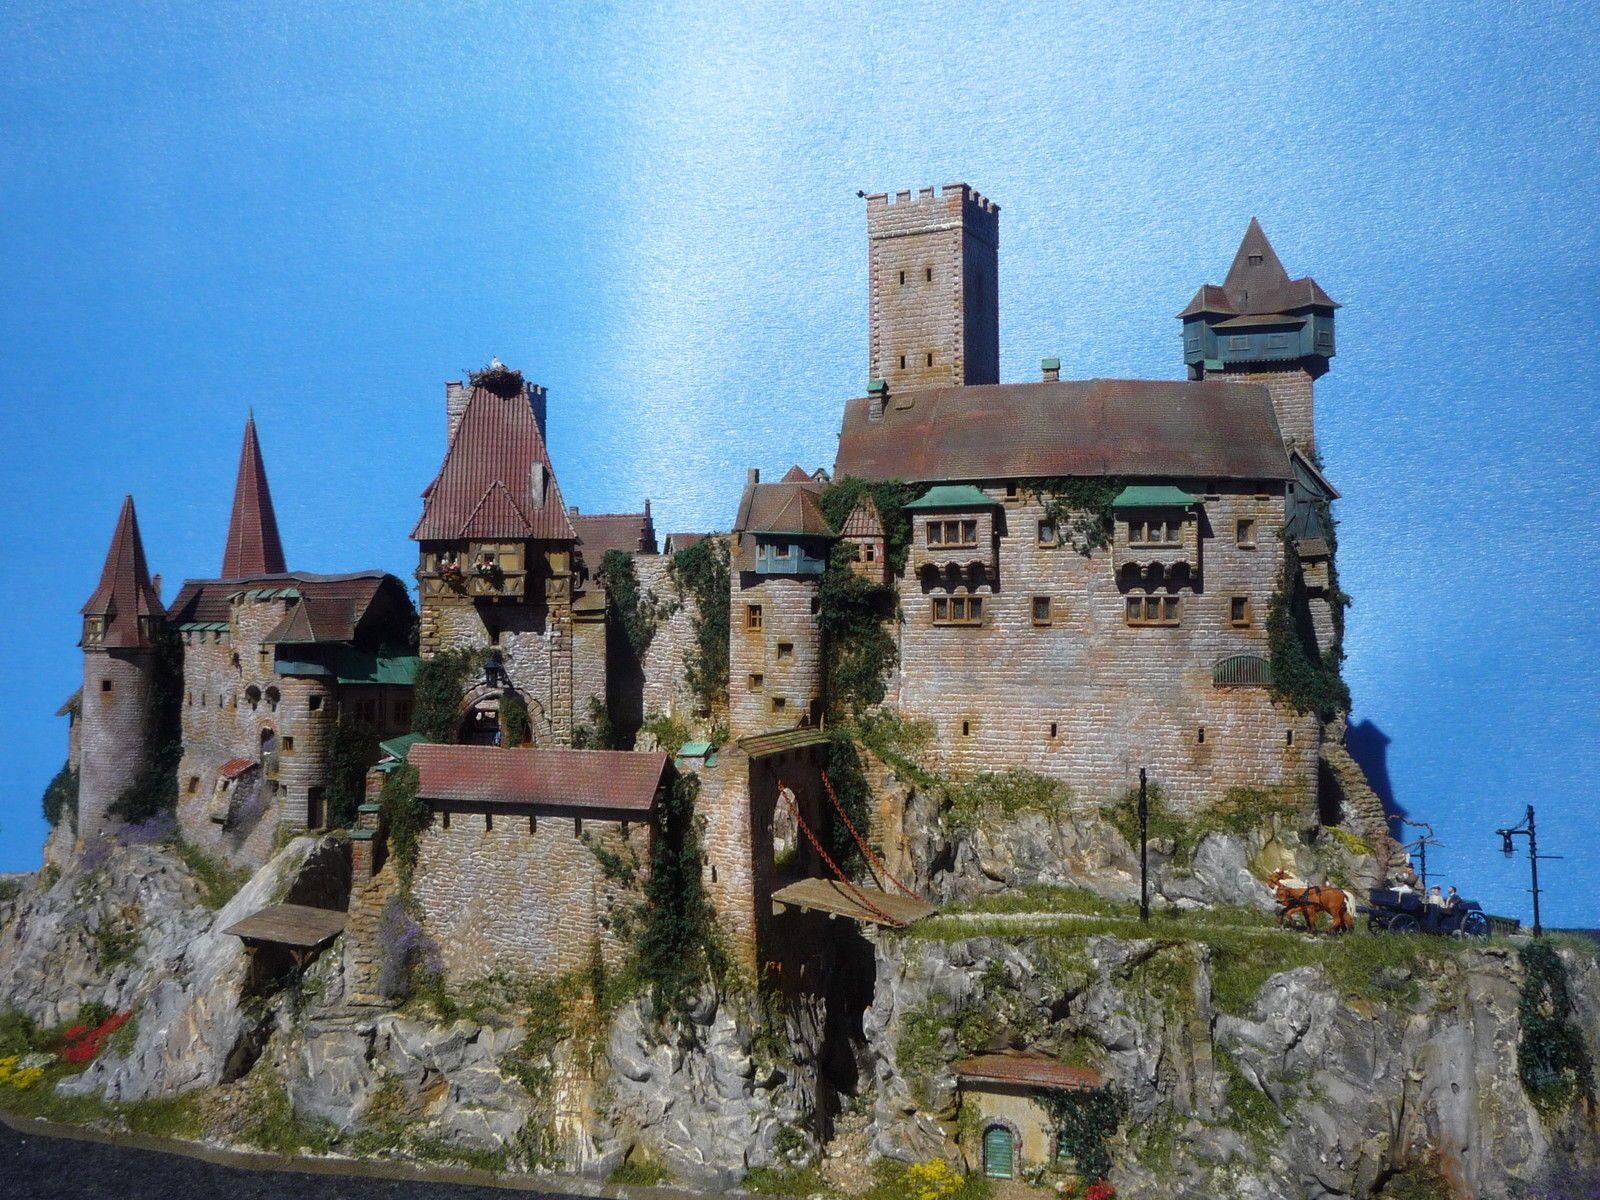 Diorama castle burg schloss elbenwald patiniert - Kutsche playmobil ...